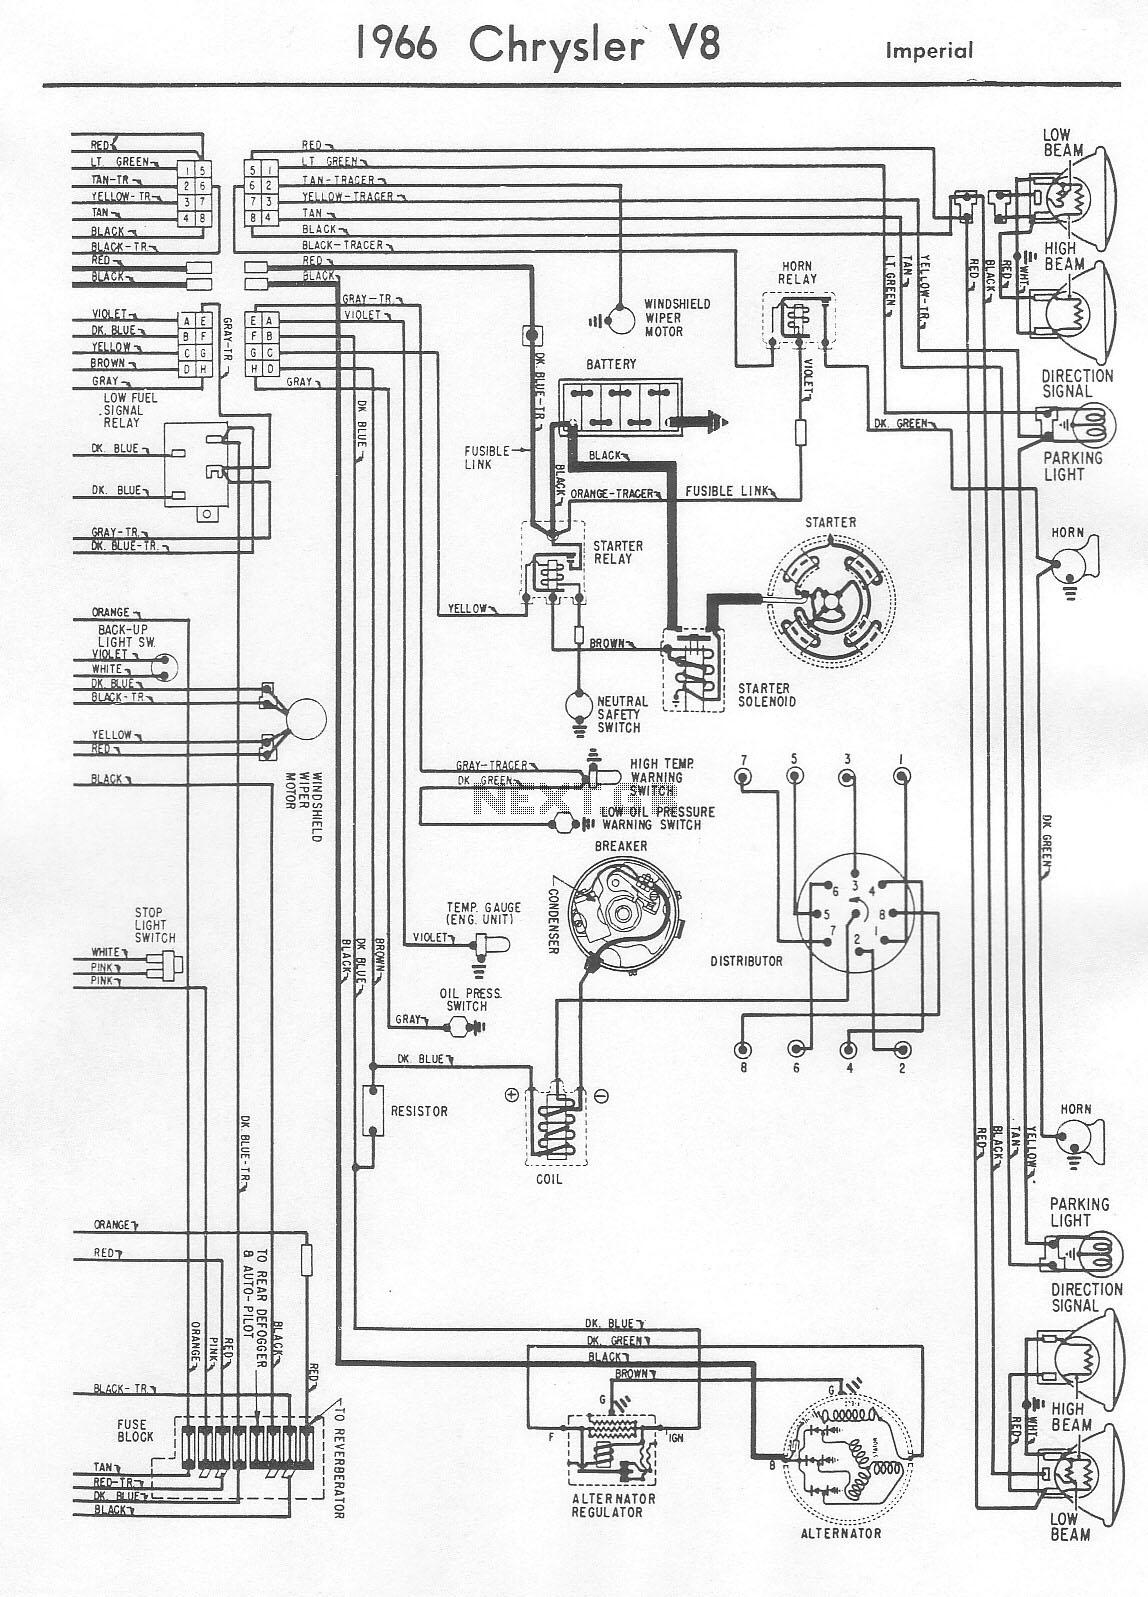 jetta mk4 radio wiring diagram hyster s50xm forklift 2 engine diagrams auto fuse box